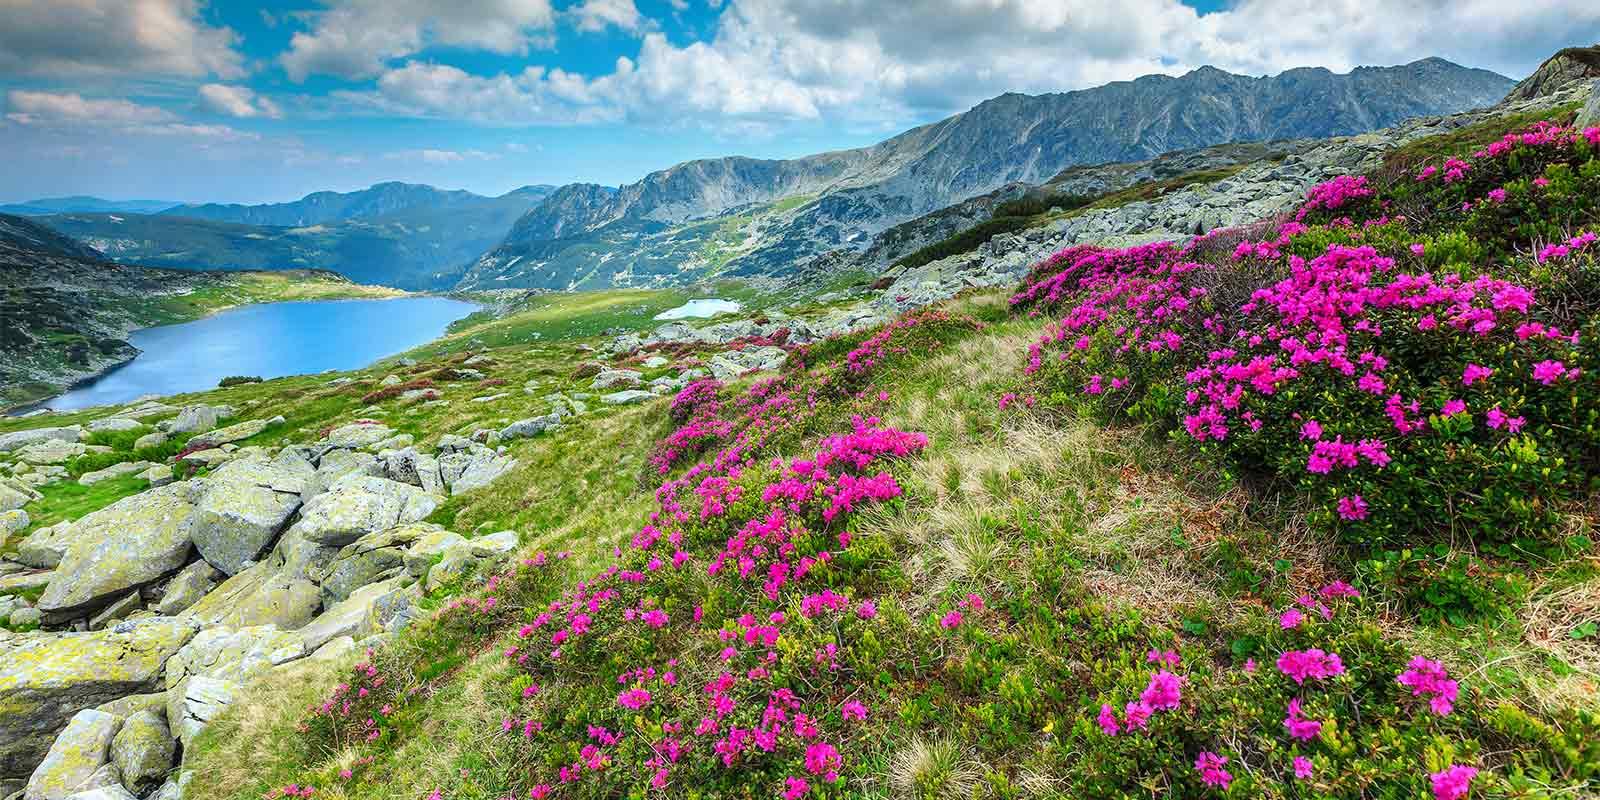 Alpine glacial lake in the Carpathian mountains in Romania